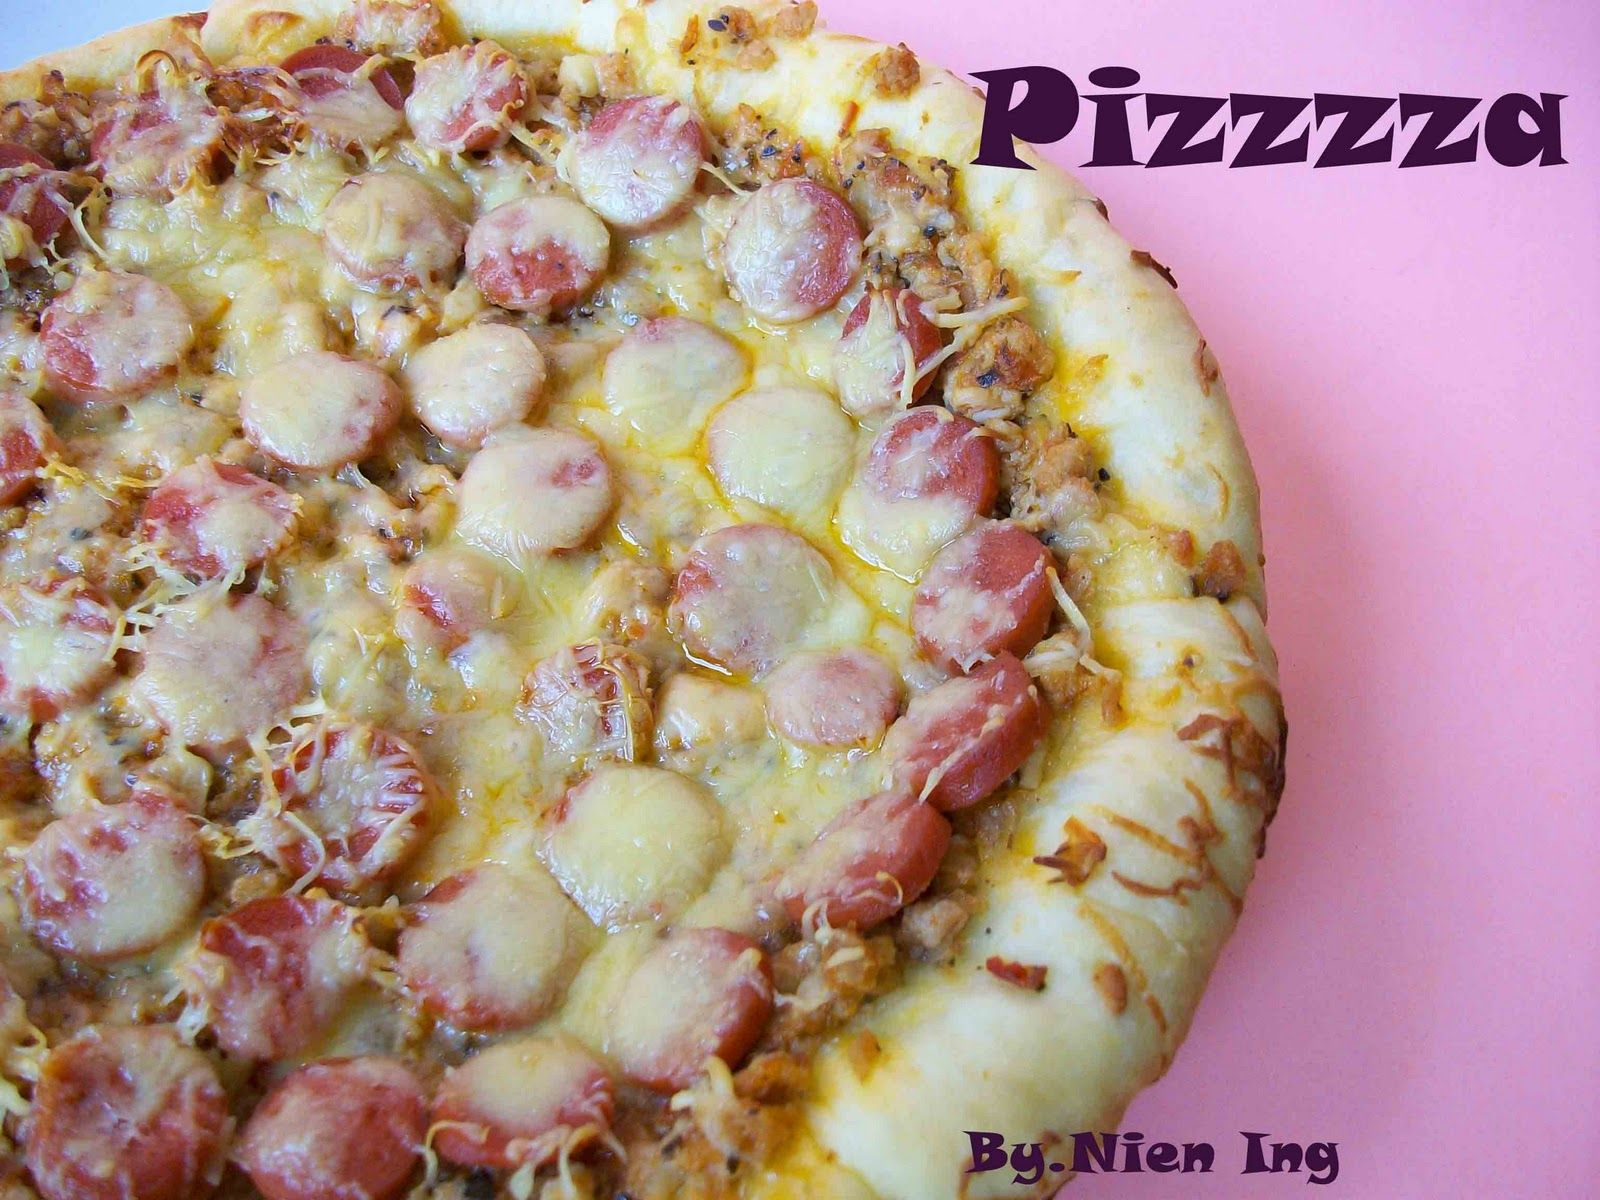 Pizzzzzzzza Akhirya Aku Bikin Pizza Juga Setelah Bertanya Sana Sini Ternyata Aku Lebih Sreg Pake Resep Roti Pizza Nya Dari Mbak Y Resep Resep Roti Pizza